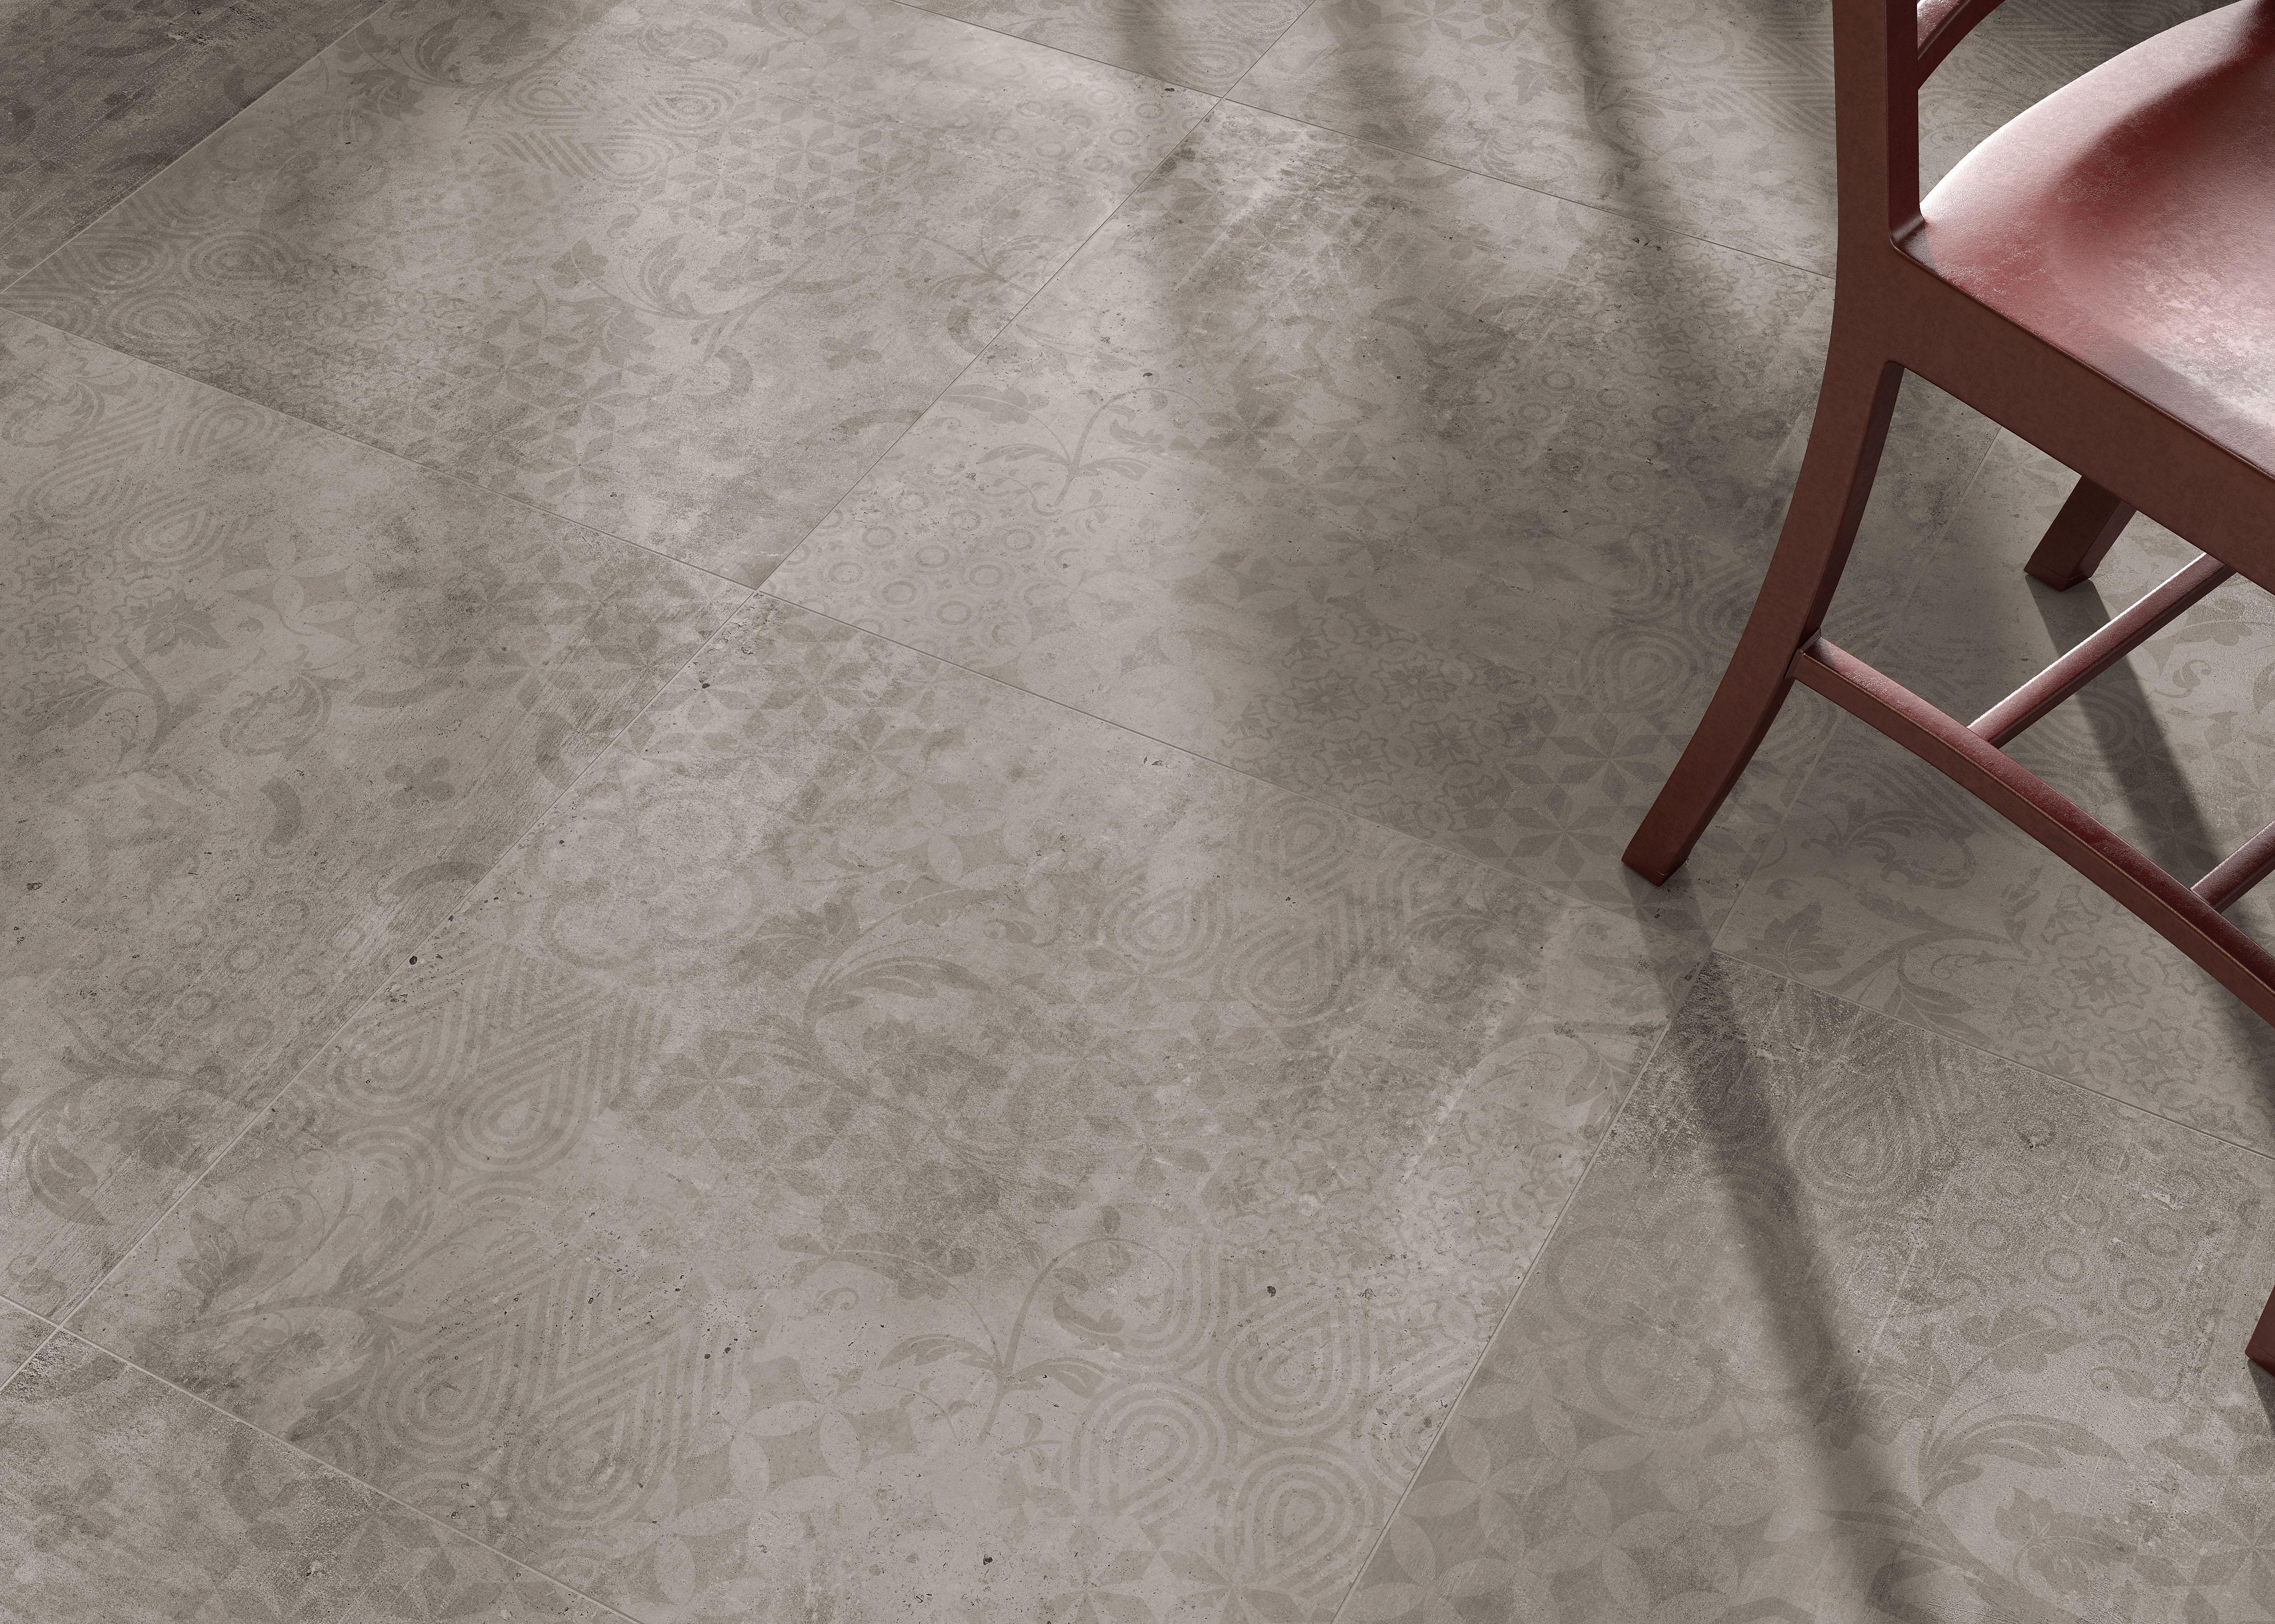 Grey Decor Betonfliesen auf dem Boden, grey decor concrete effect tiles  on the floor